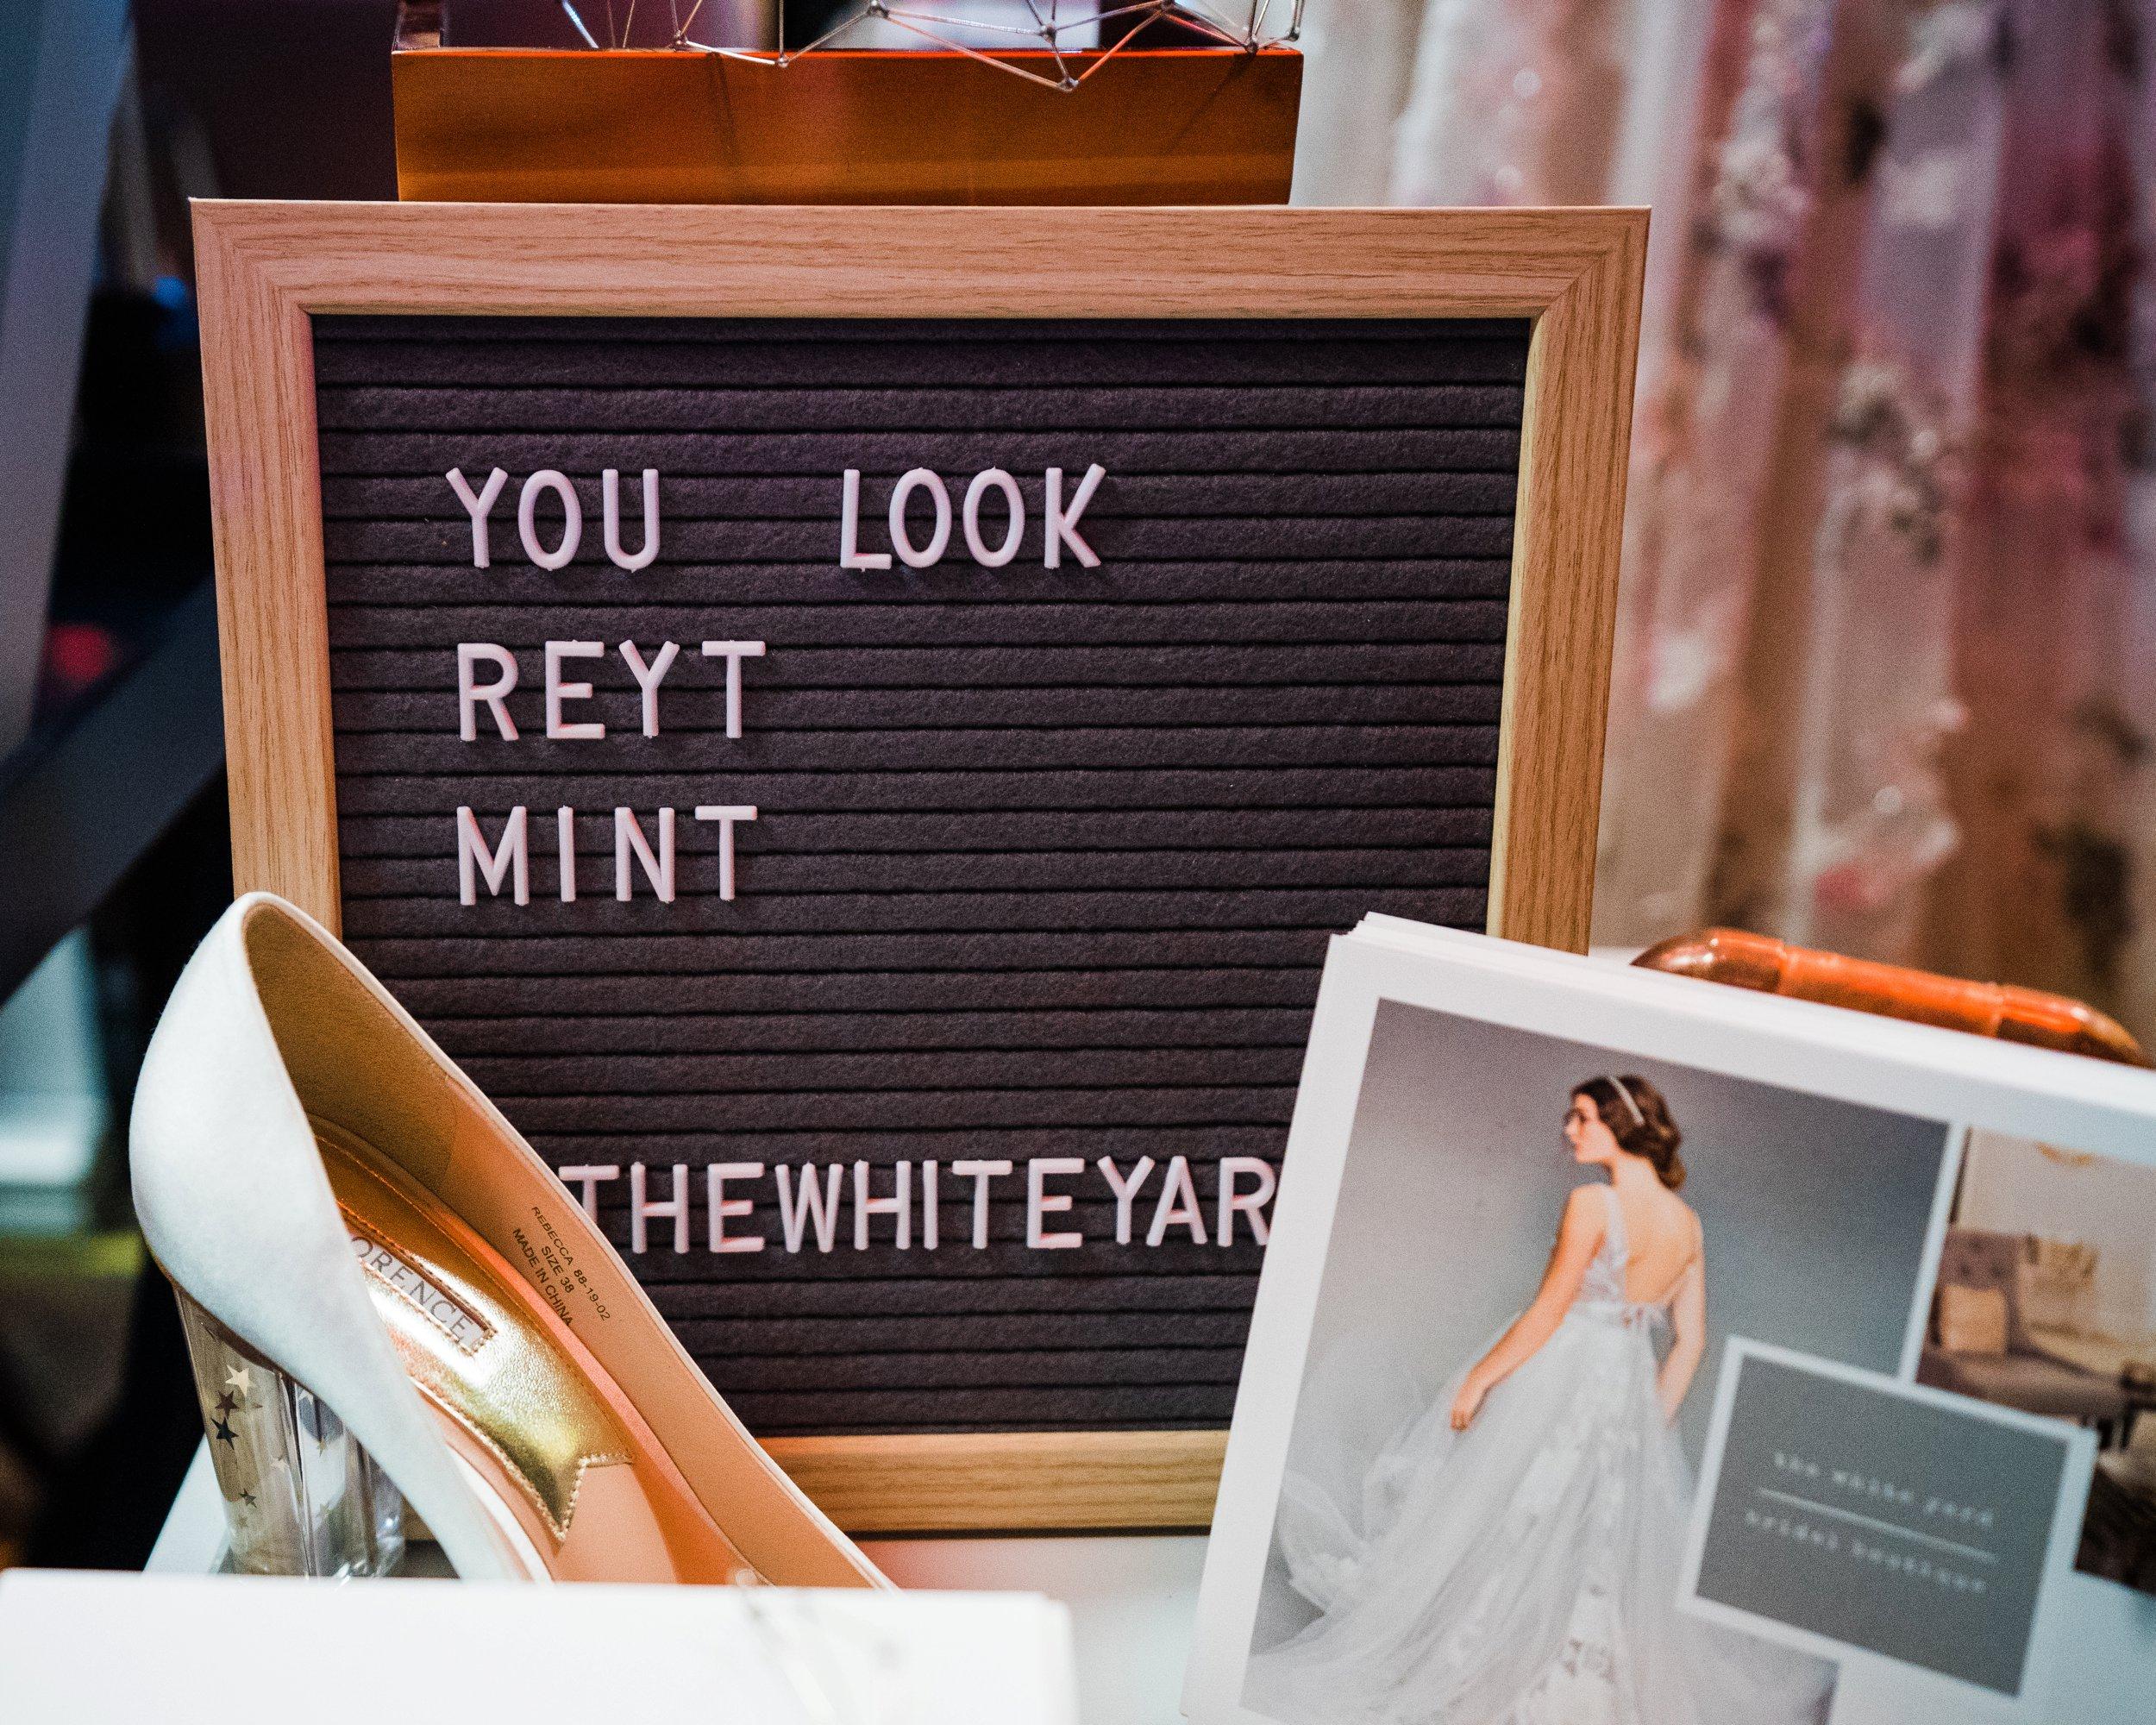 The UN-WEDDING SHOW 2019 cool bride style modern wedding fair Leeds Duke Studios 00008.jpg